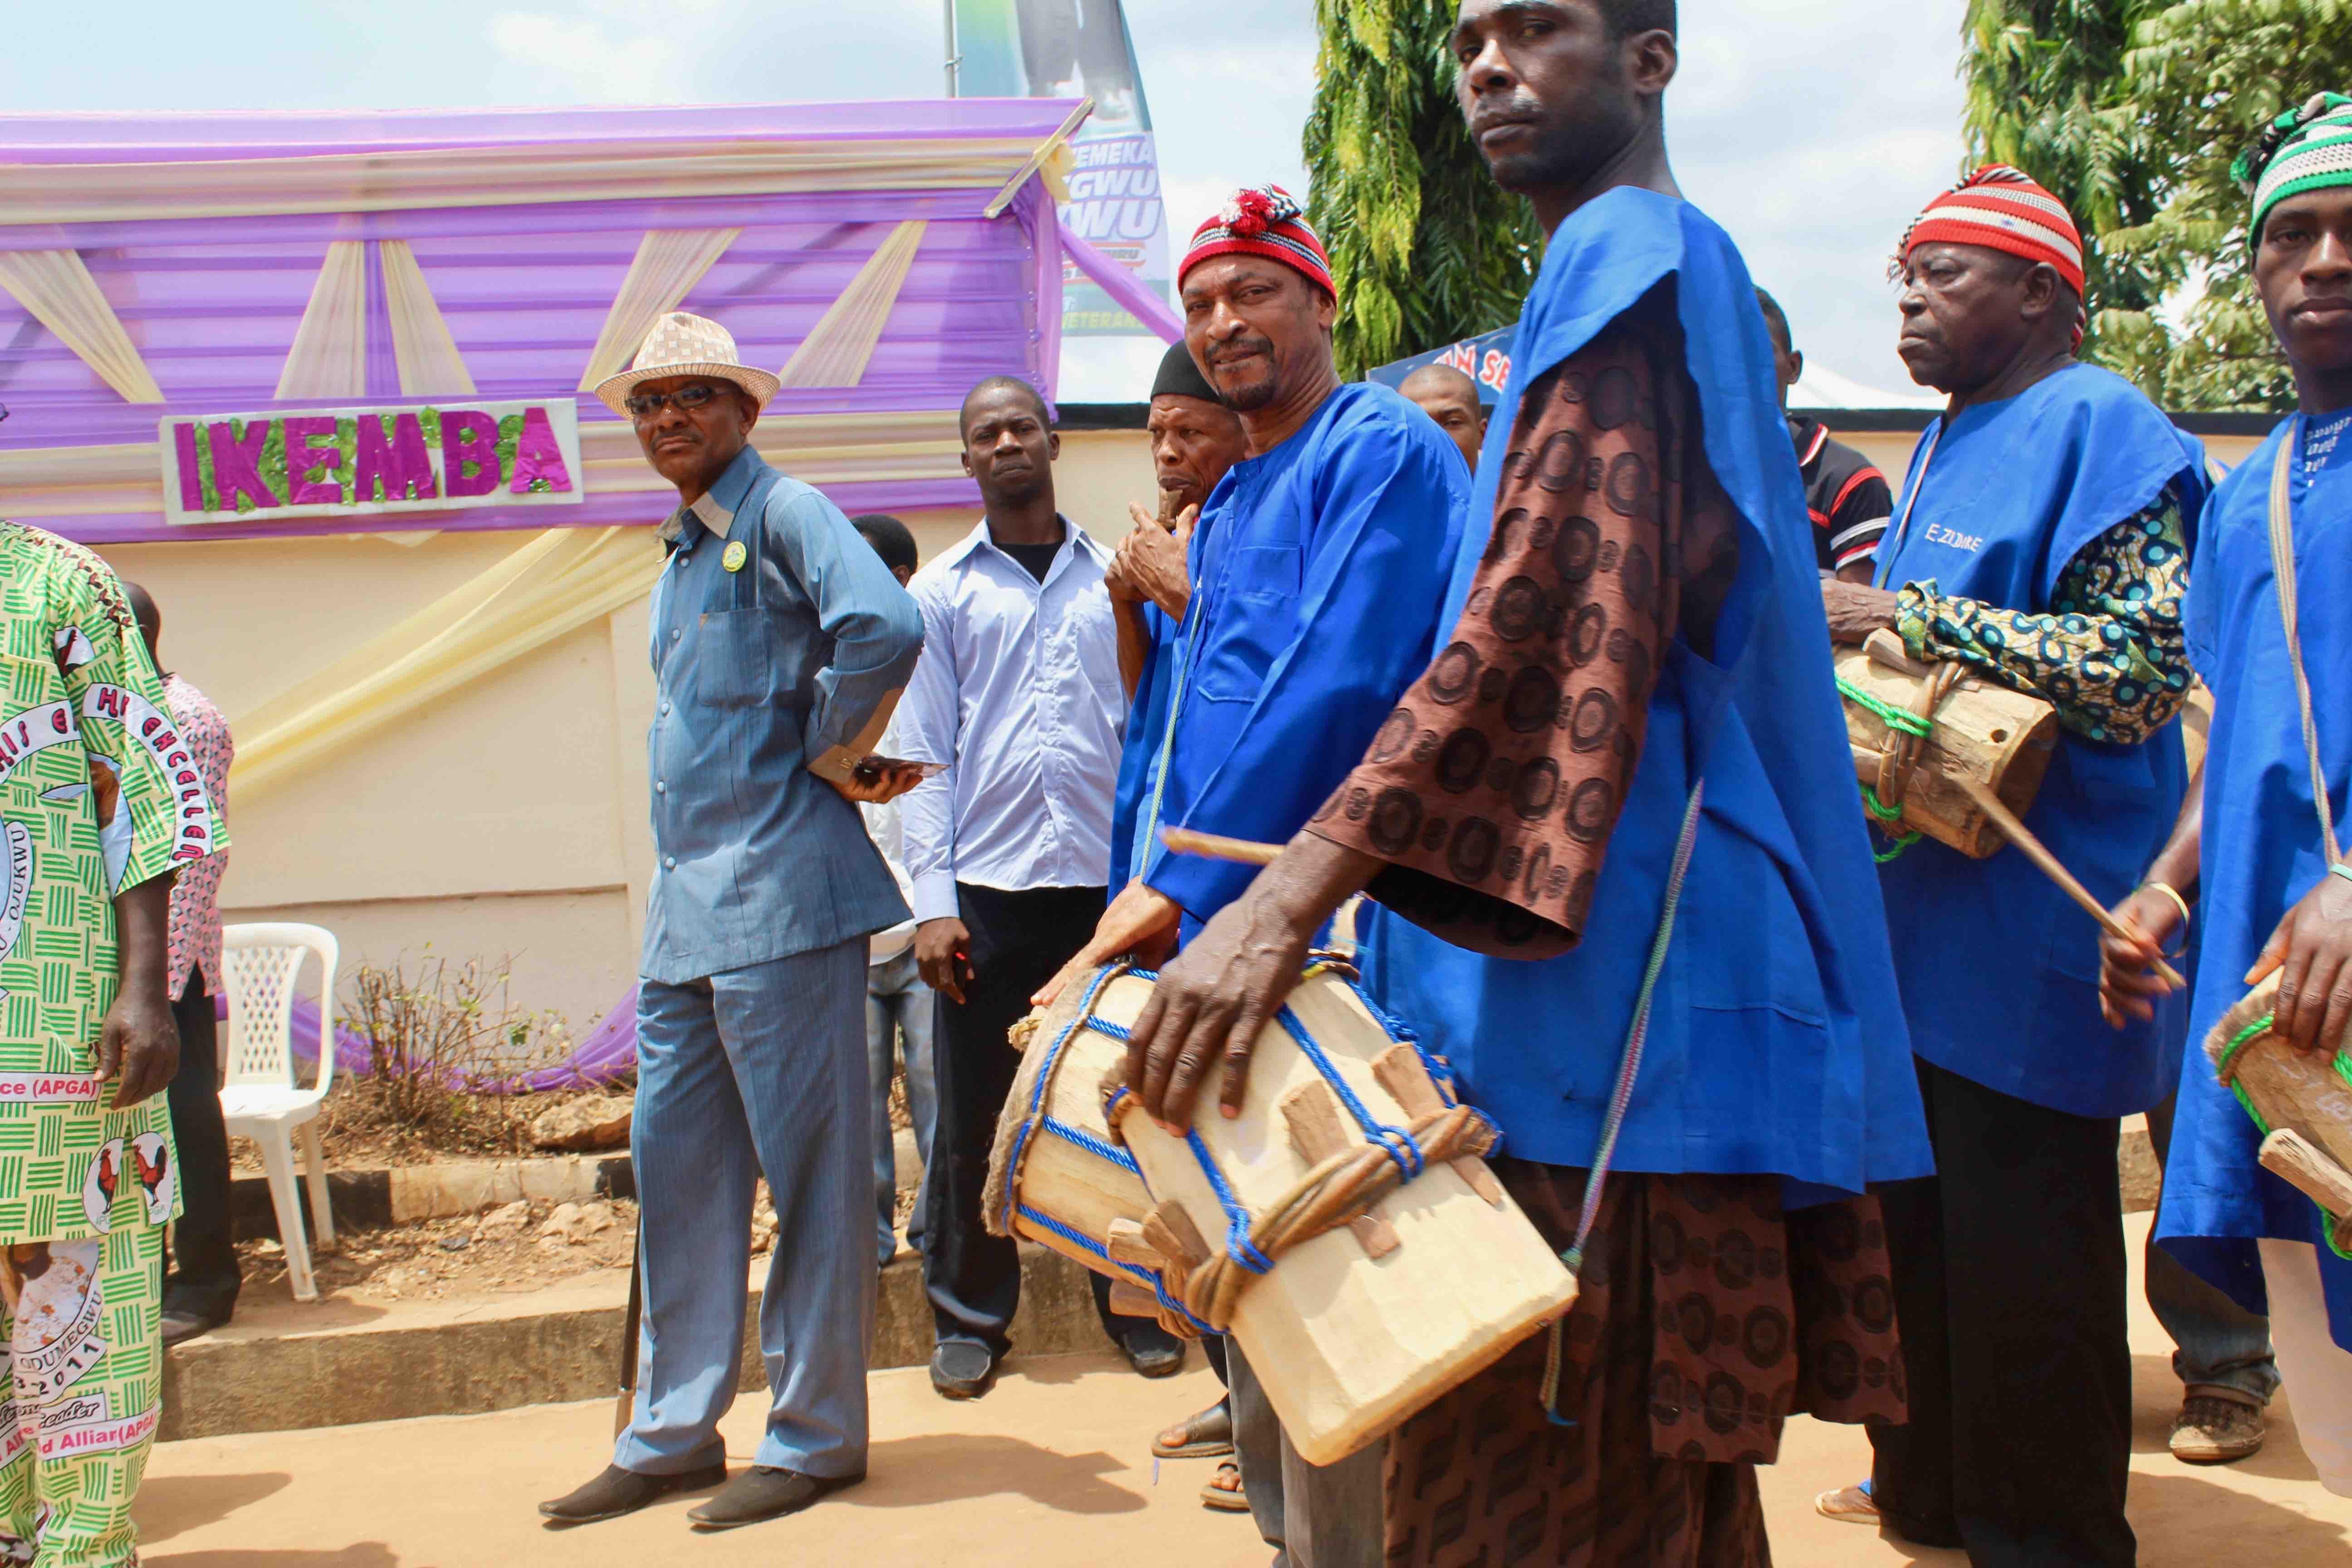 Nnewi Traditional Drummers, at the funeral service of Chukwuemeka Odumegwu Ojukwu, in Nnewi, Anambra State, Nigeria. #JujuFilms